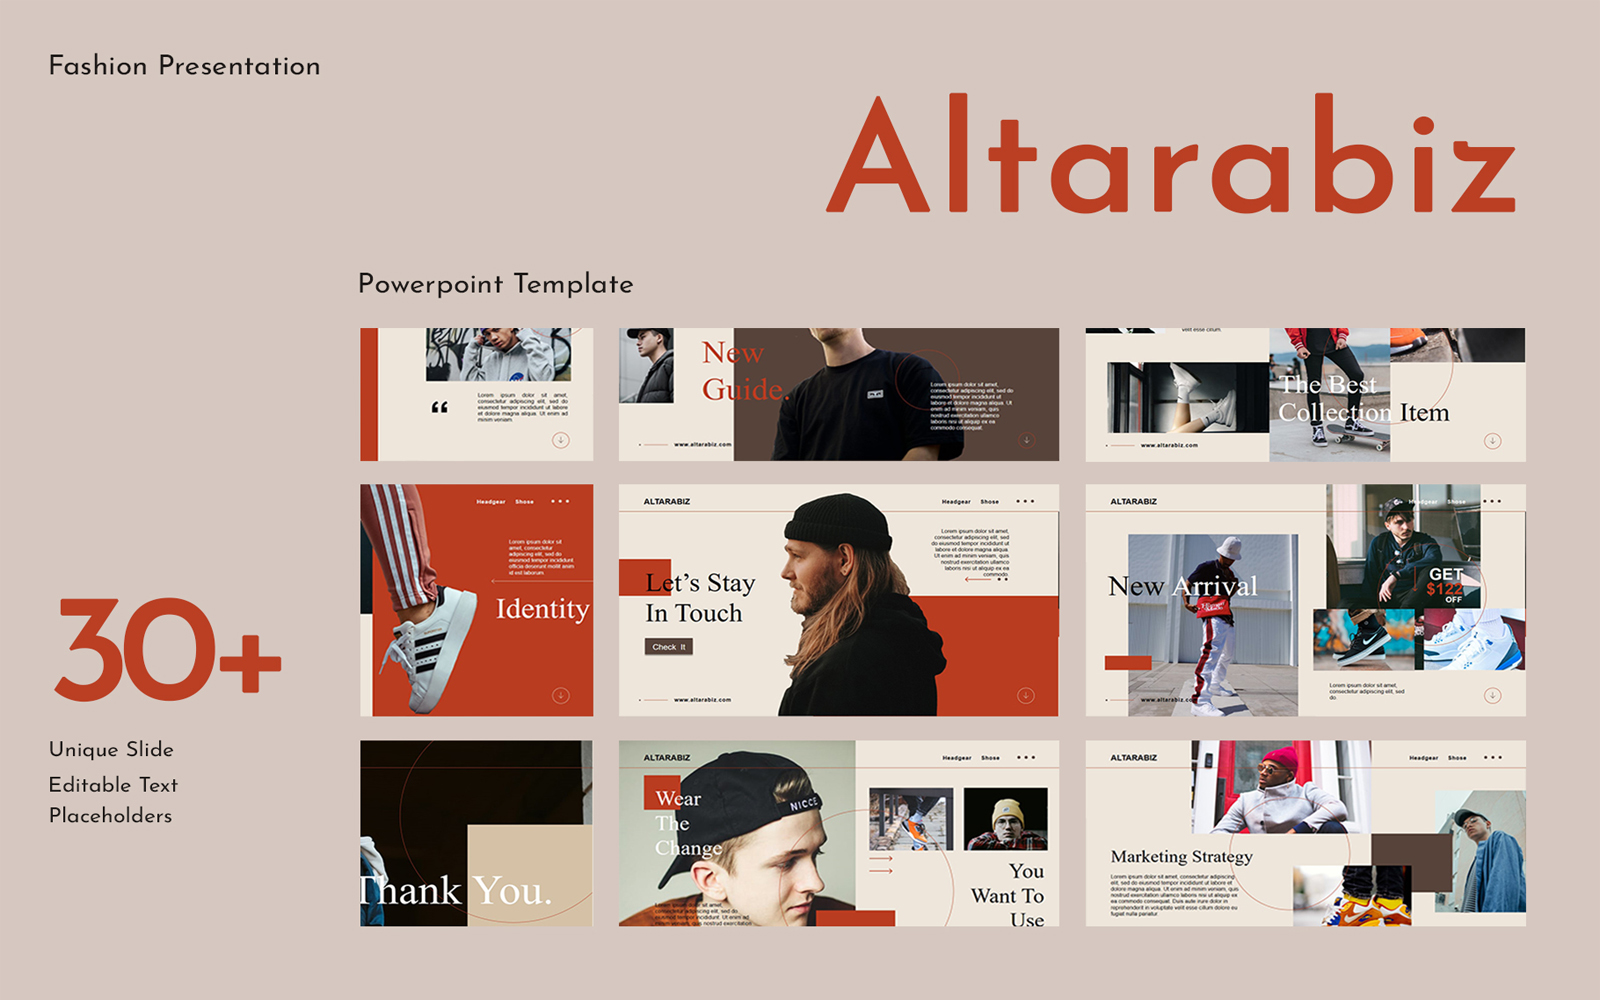 Altarabiz Presentation PowerPoint Template